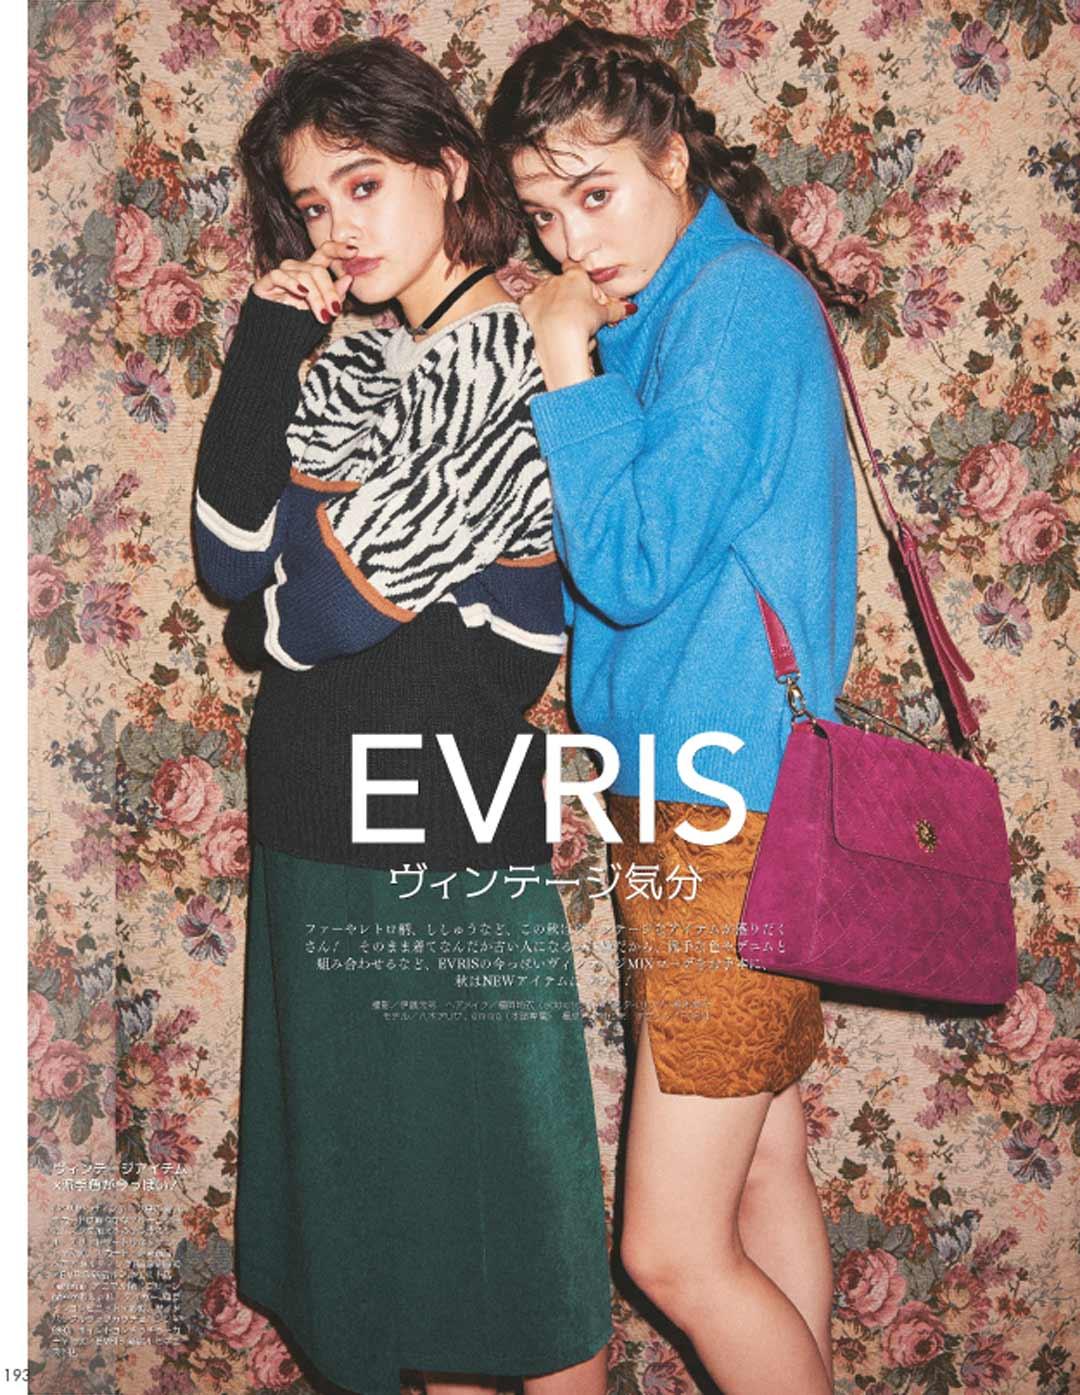 ViVi 11月号P.193『EVRIS[エヴリス]【ヴィンテージ気分】』掲載